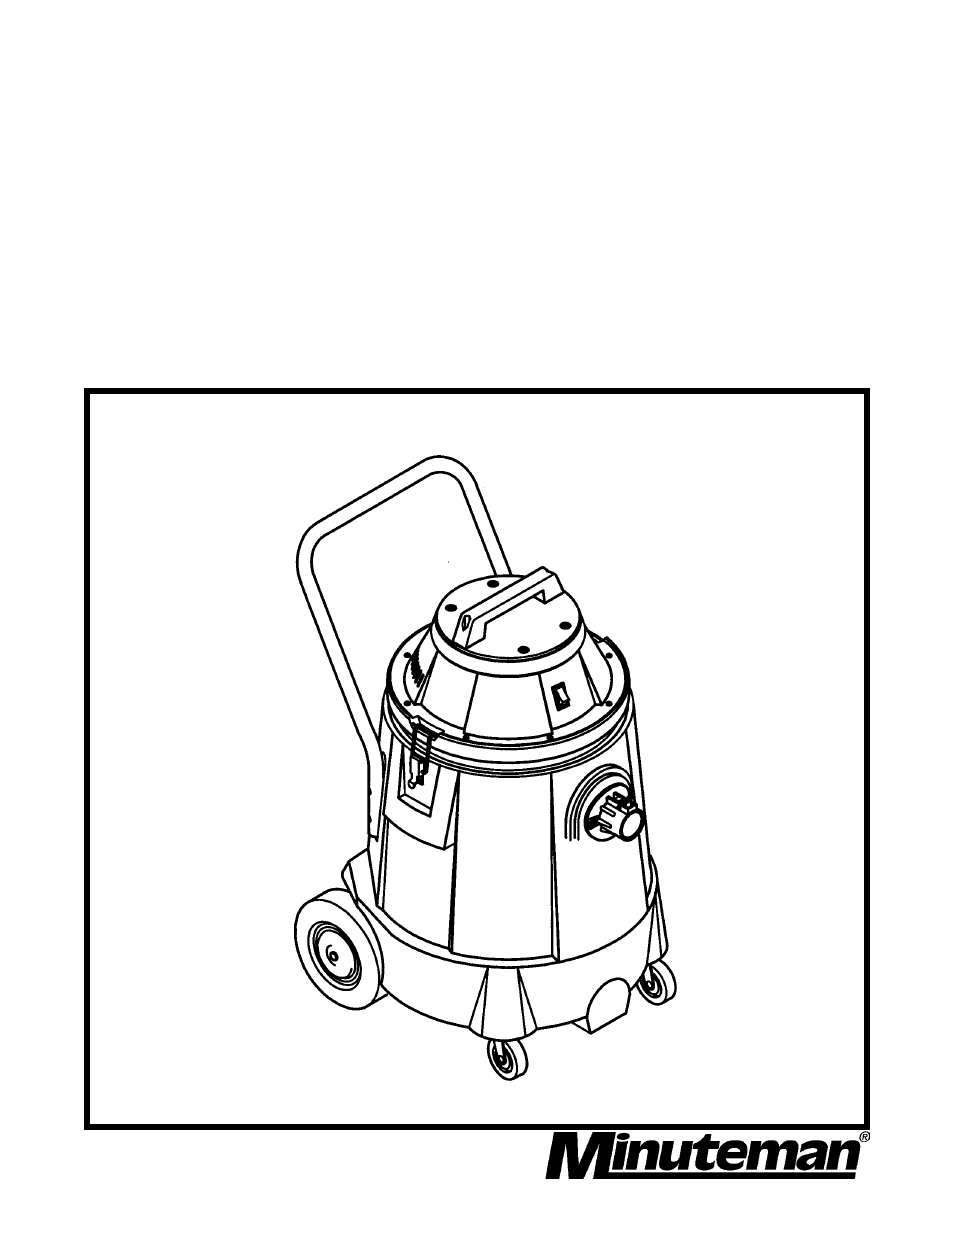 Minuteman C82940-00 Critical Filter Vacuum User Manual